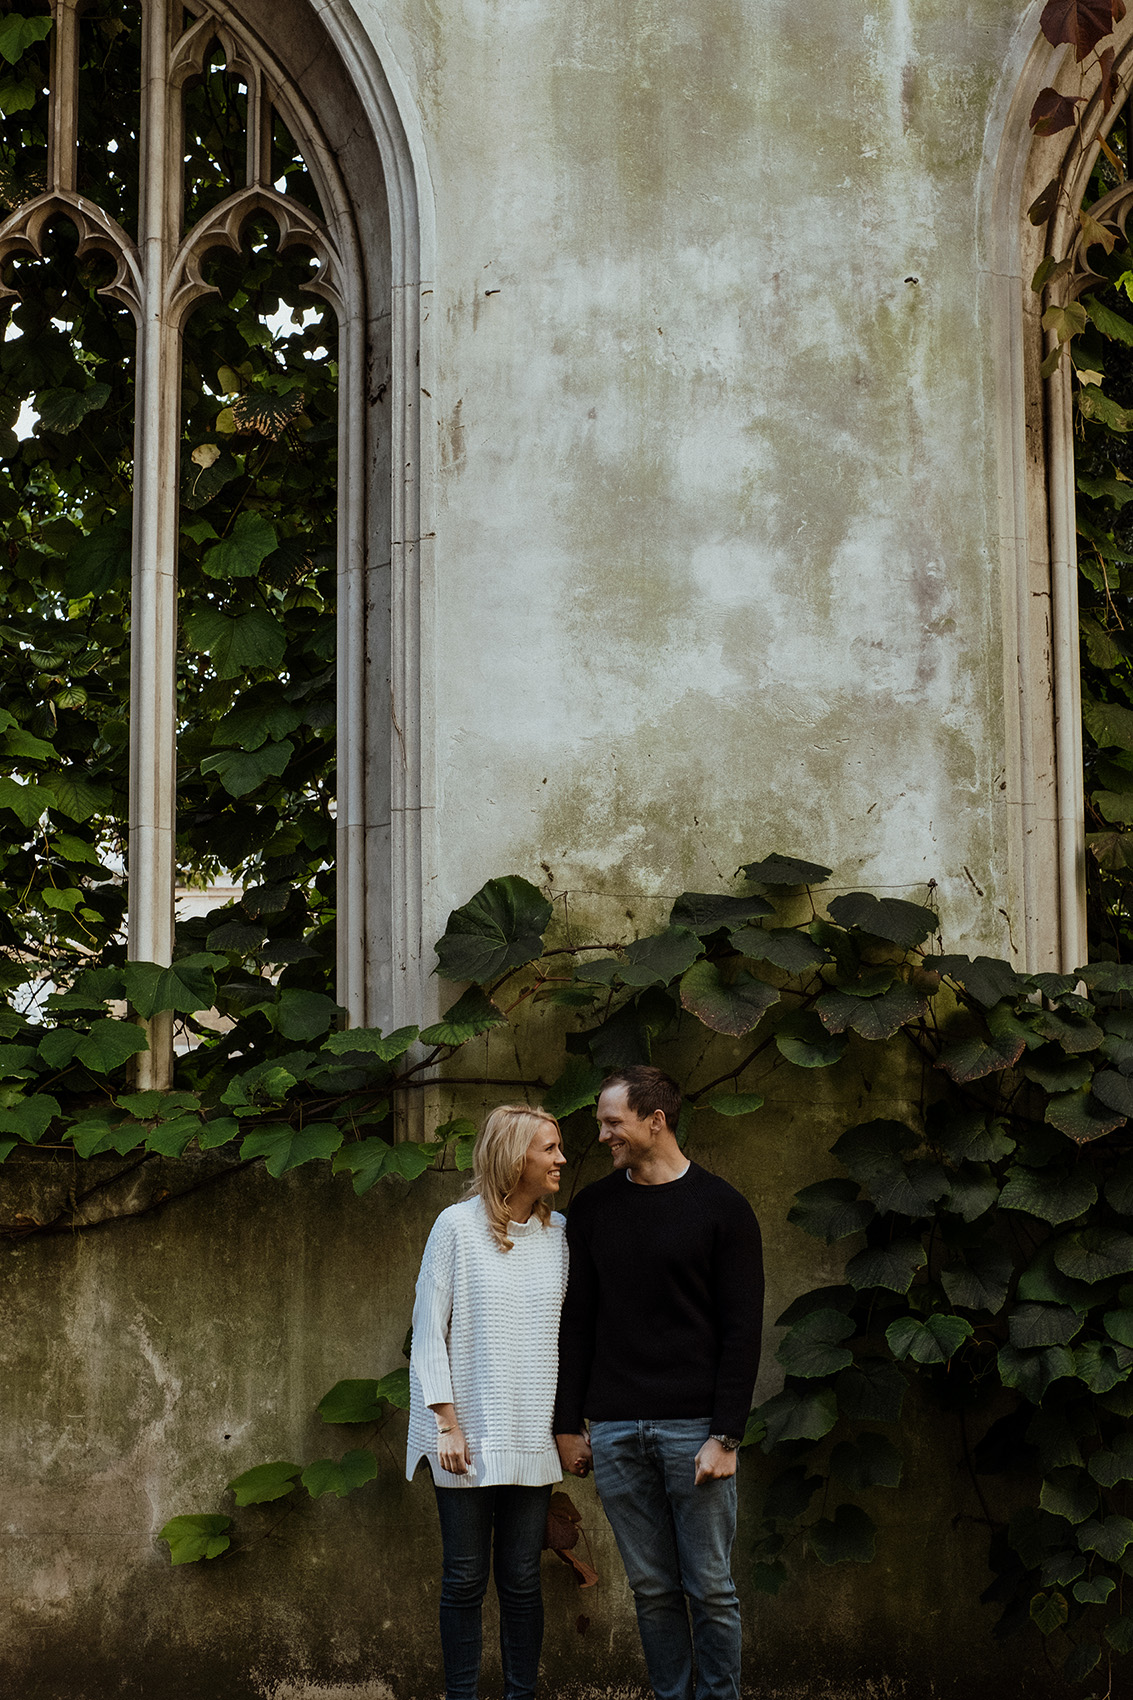 Anna-Vesty-London-engagement-photographer-9.jpg